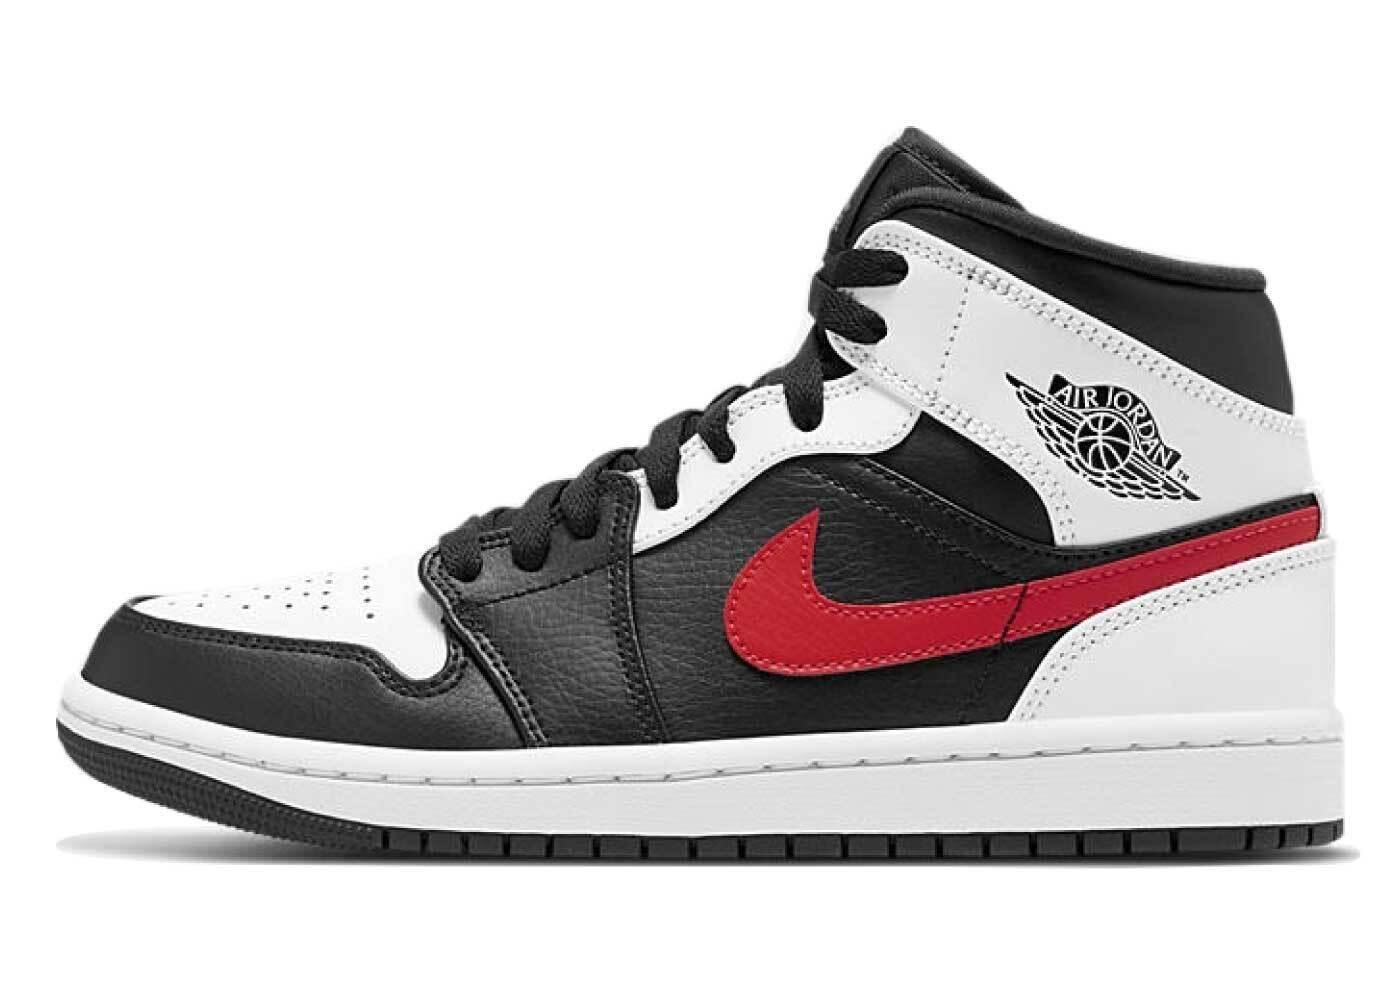 Nike Air Jordan 1 Mid Black Chile Red Whiteの写真